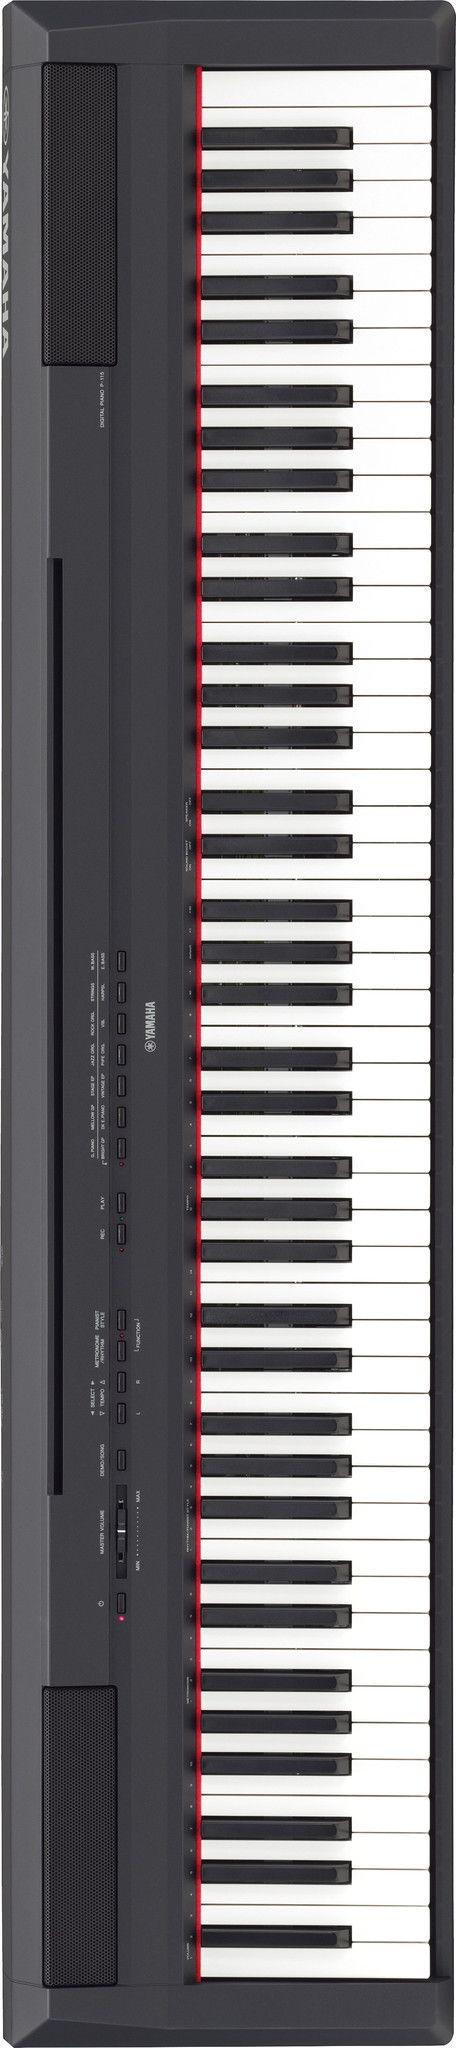 Yamaha P115 Digital Piano | Black Finish